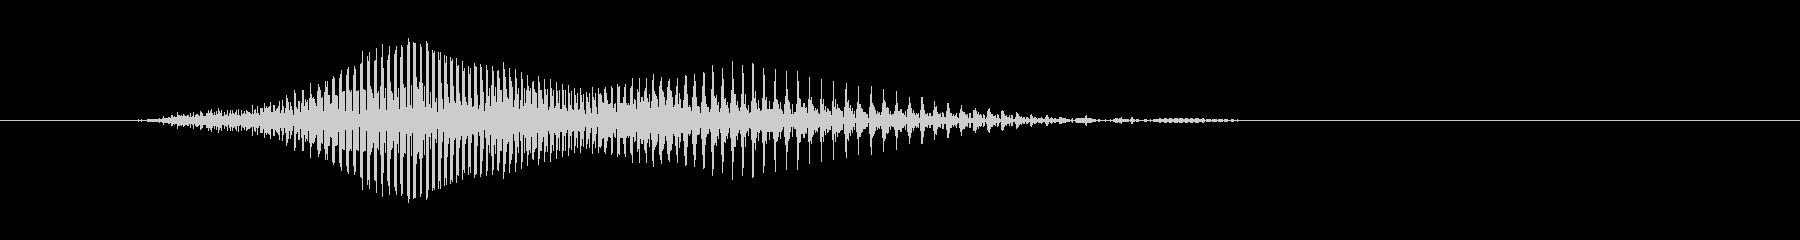 Hi(ハーイ)の未再生の波形